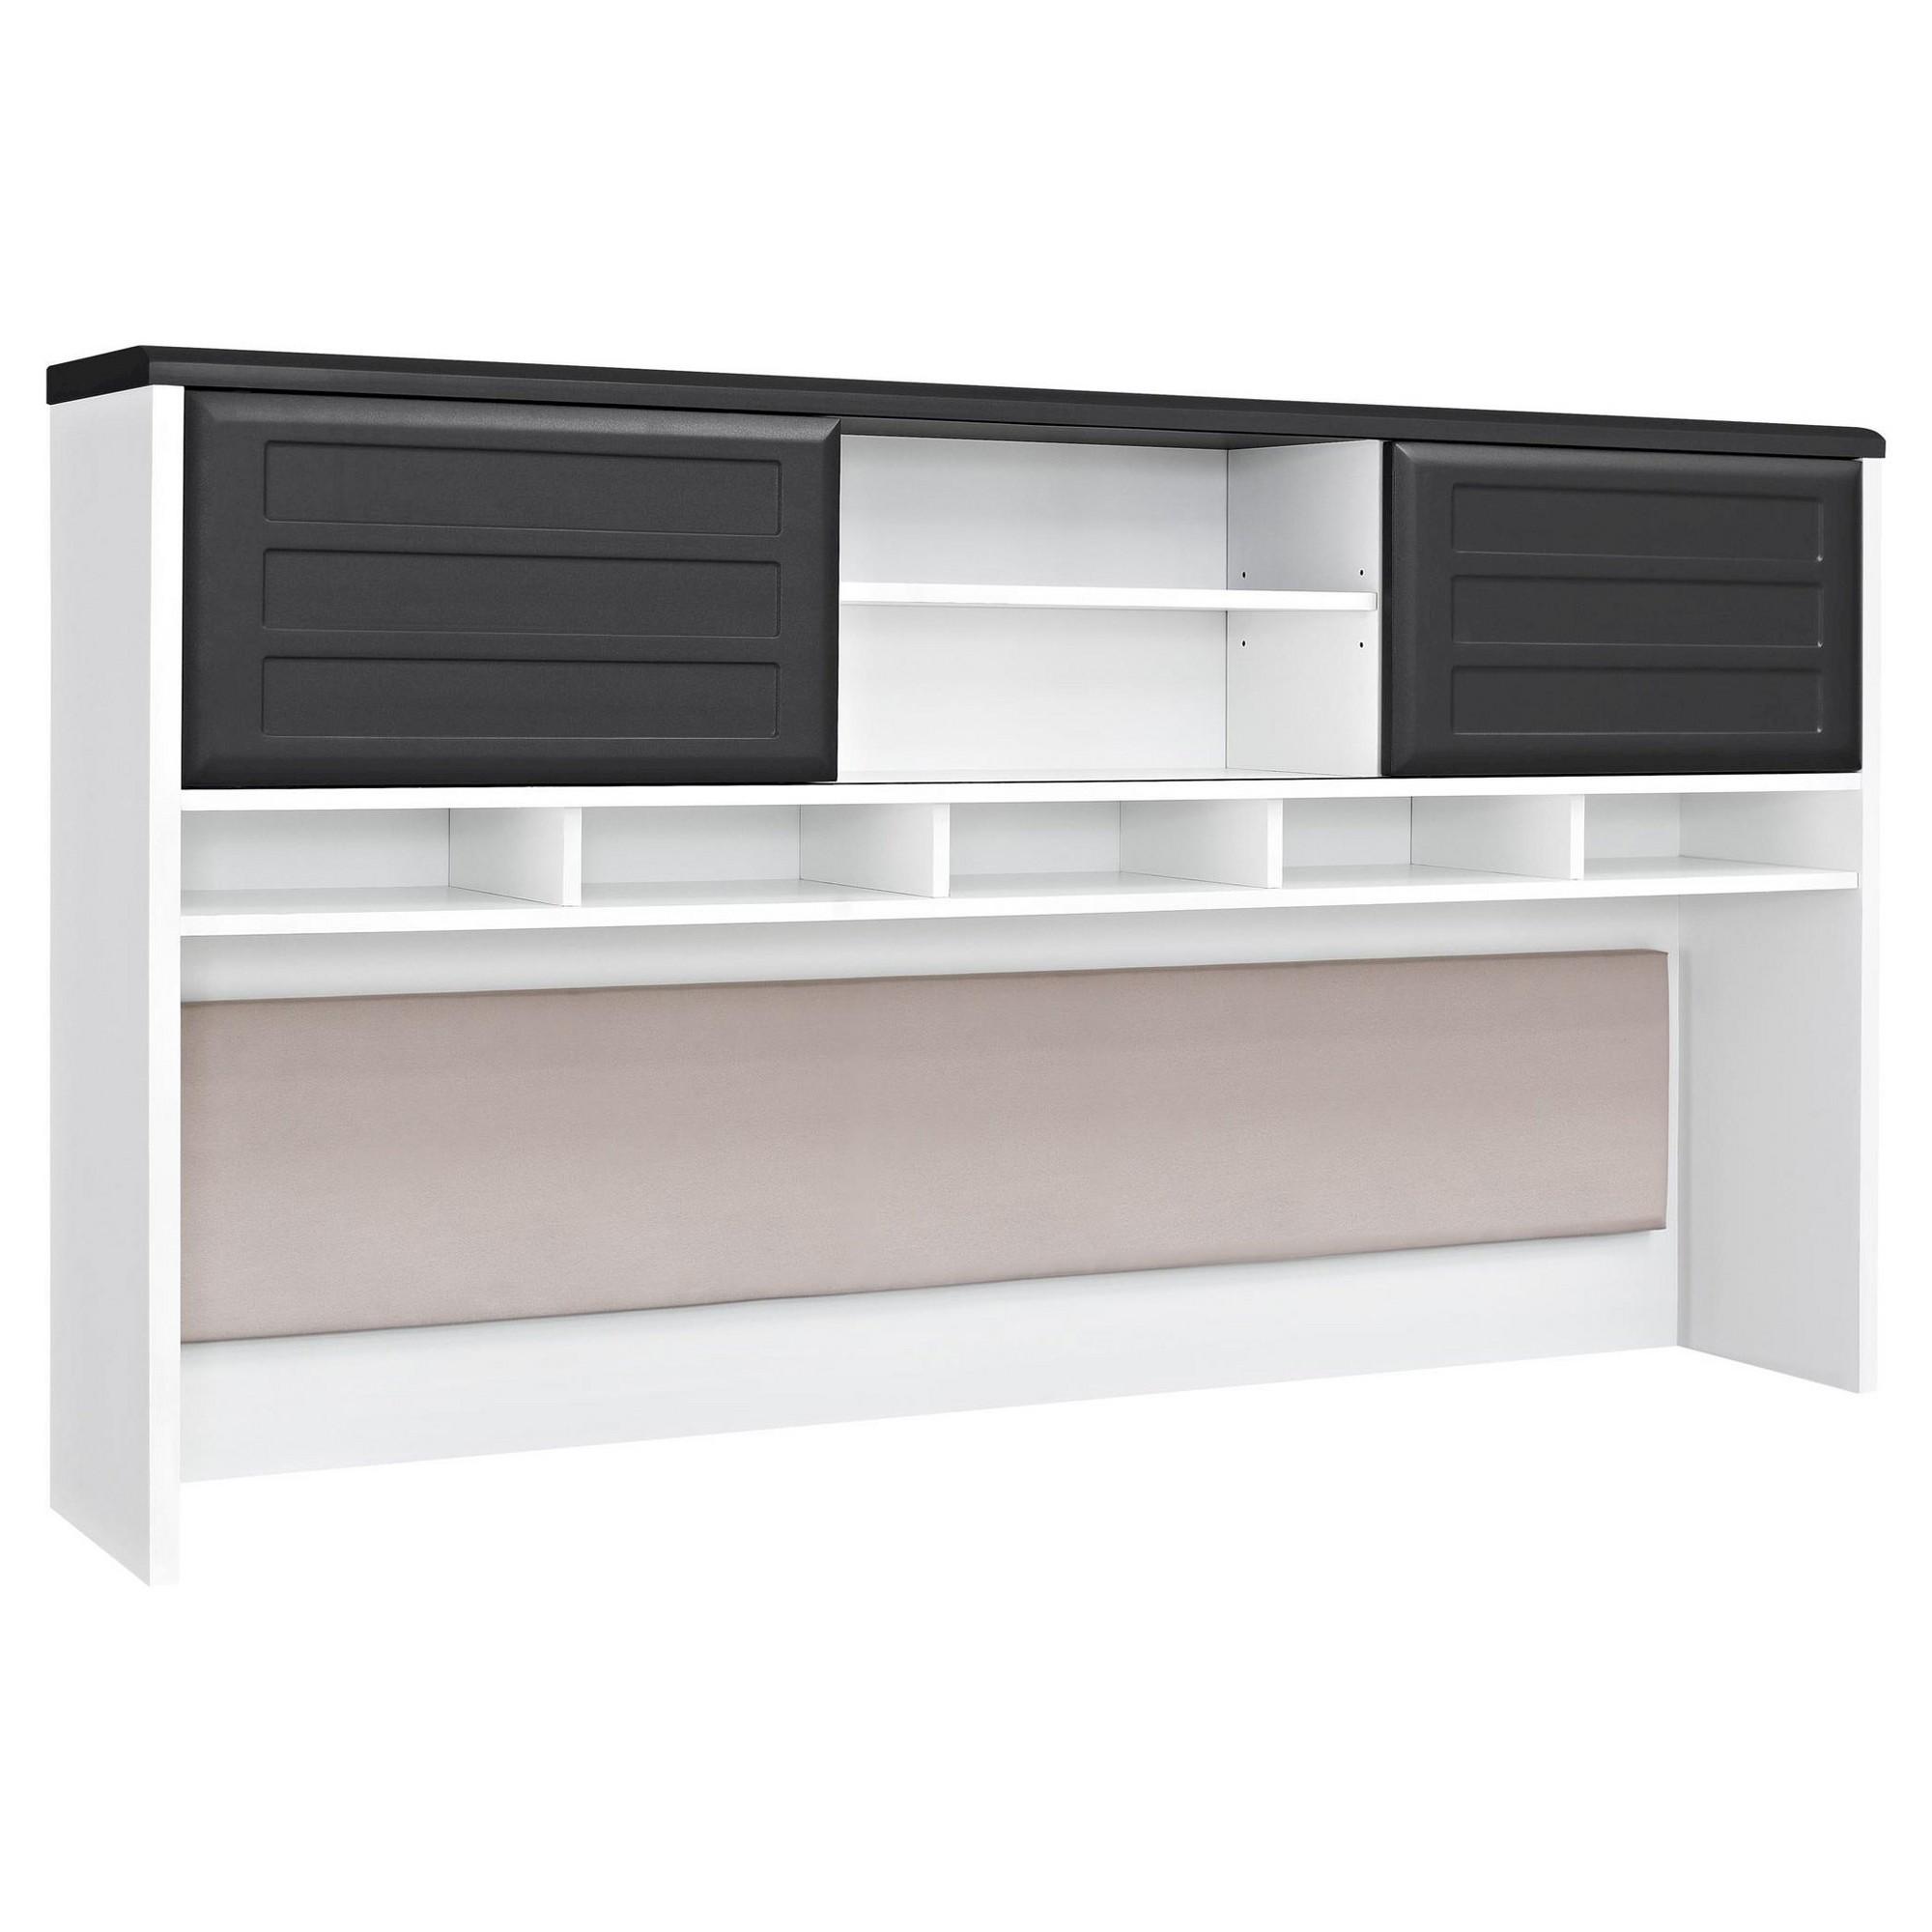 with stylish espresso bookshelves ameriwood amazon l desks industries shaped home desk instructions com in